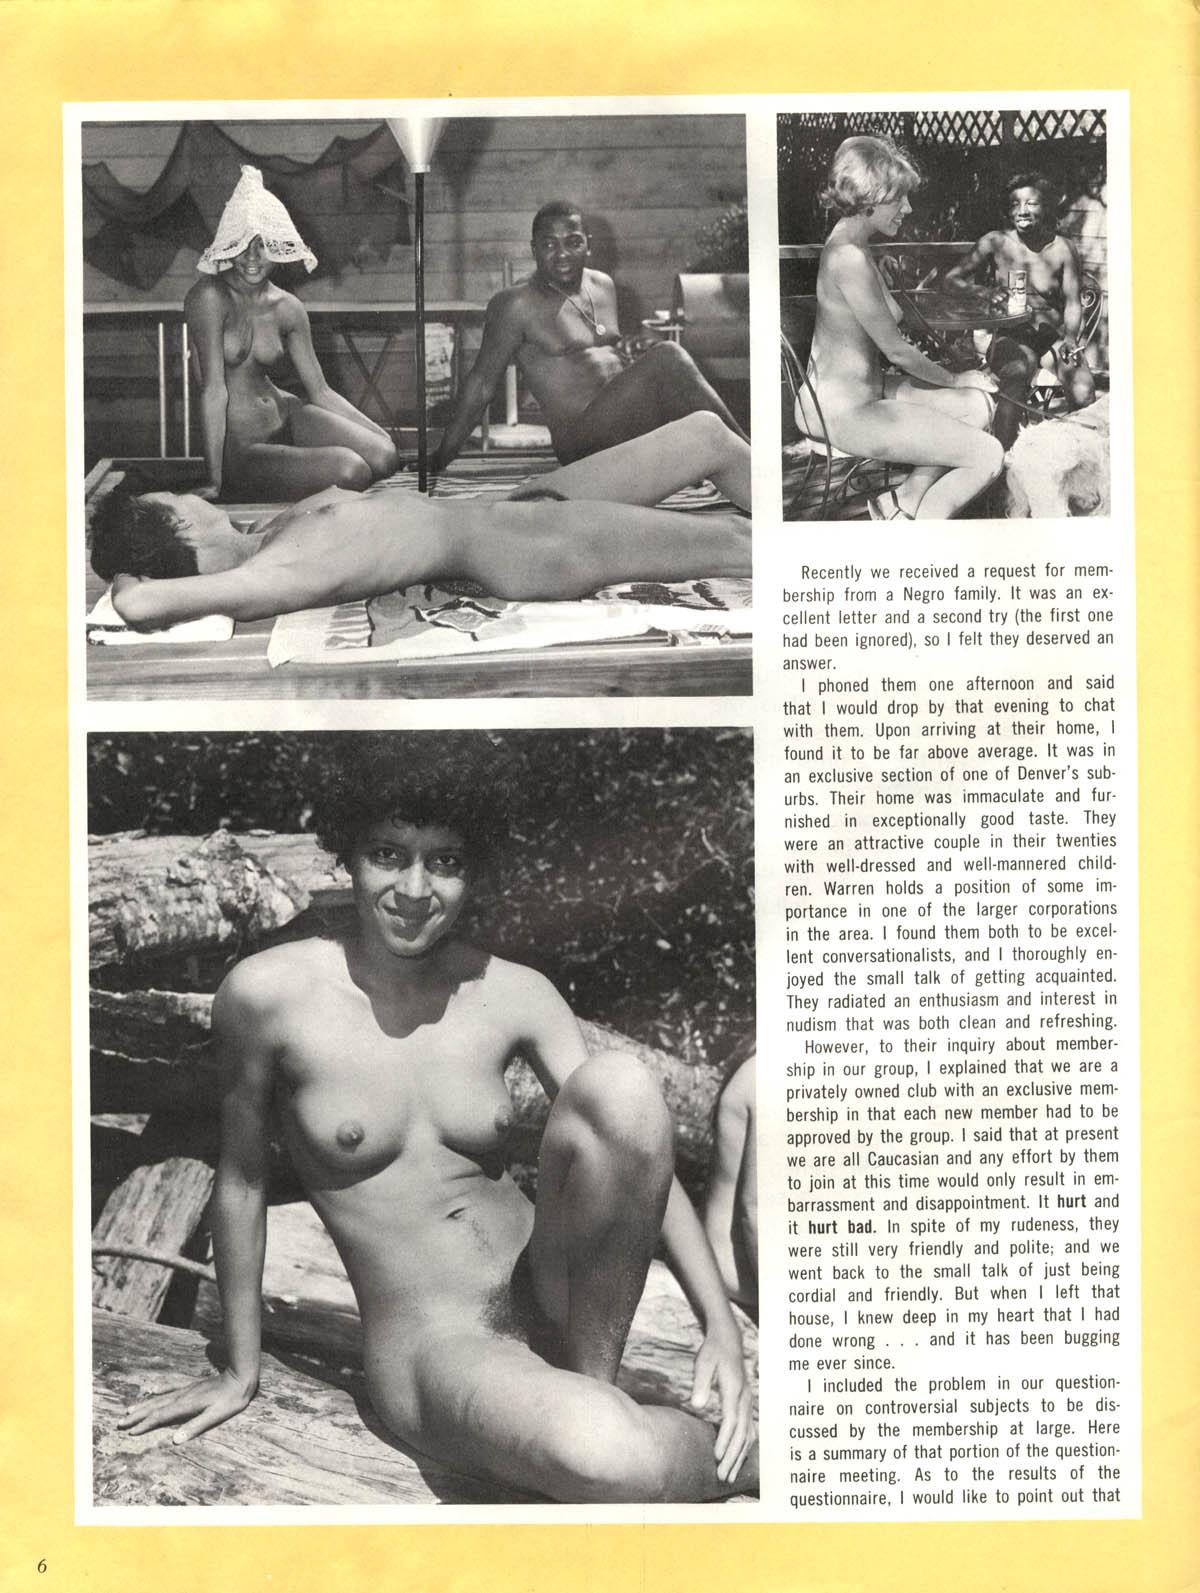 Nudist today magazine photos